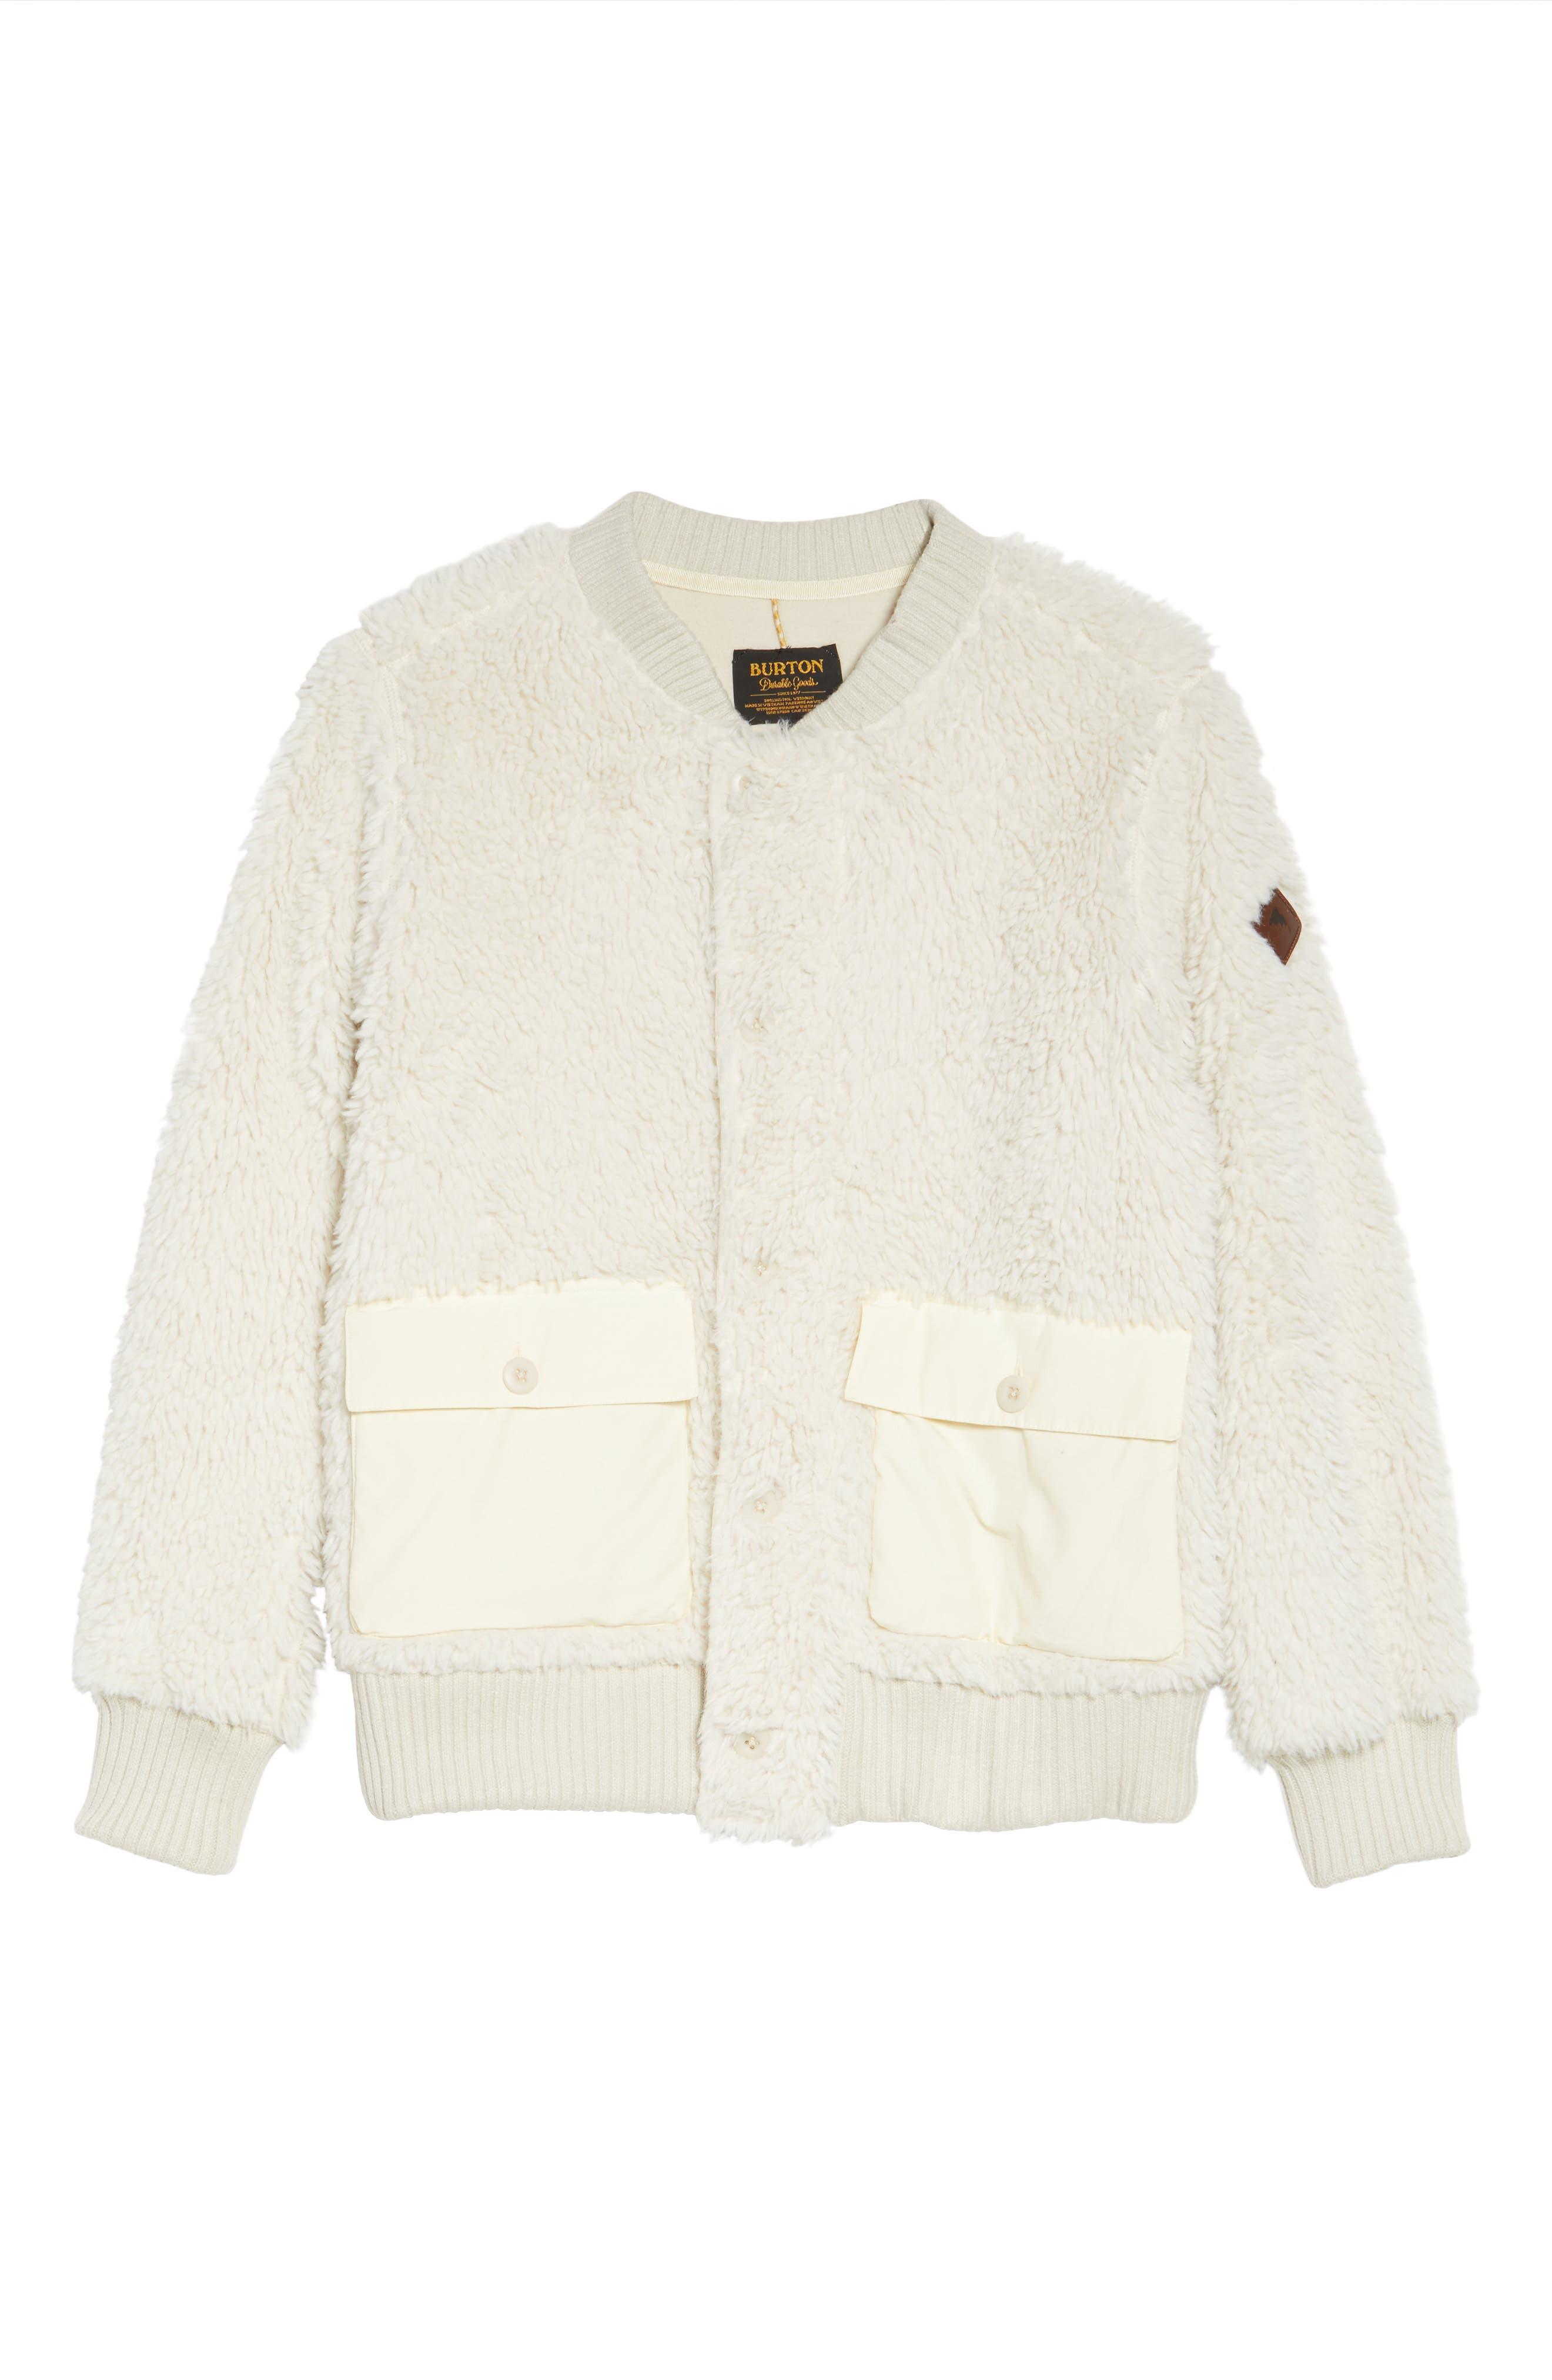 Shawmut High Pile DRYRIDE Thermex Fleece Jacket,                             Alternate thumbnail 6, color,                             100